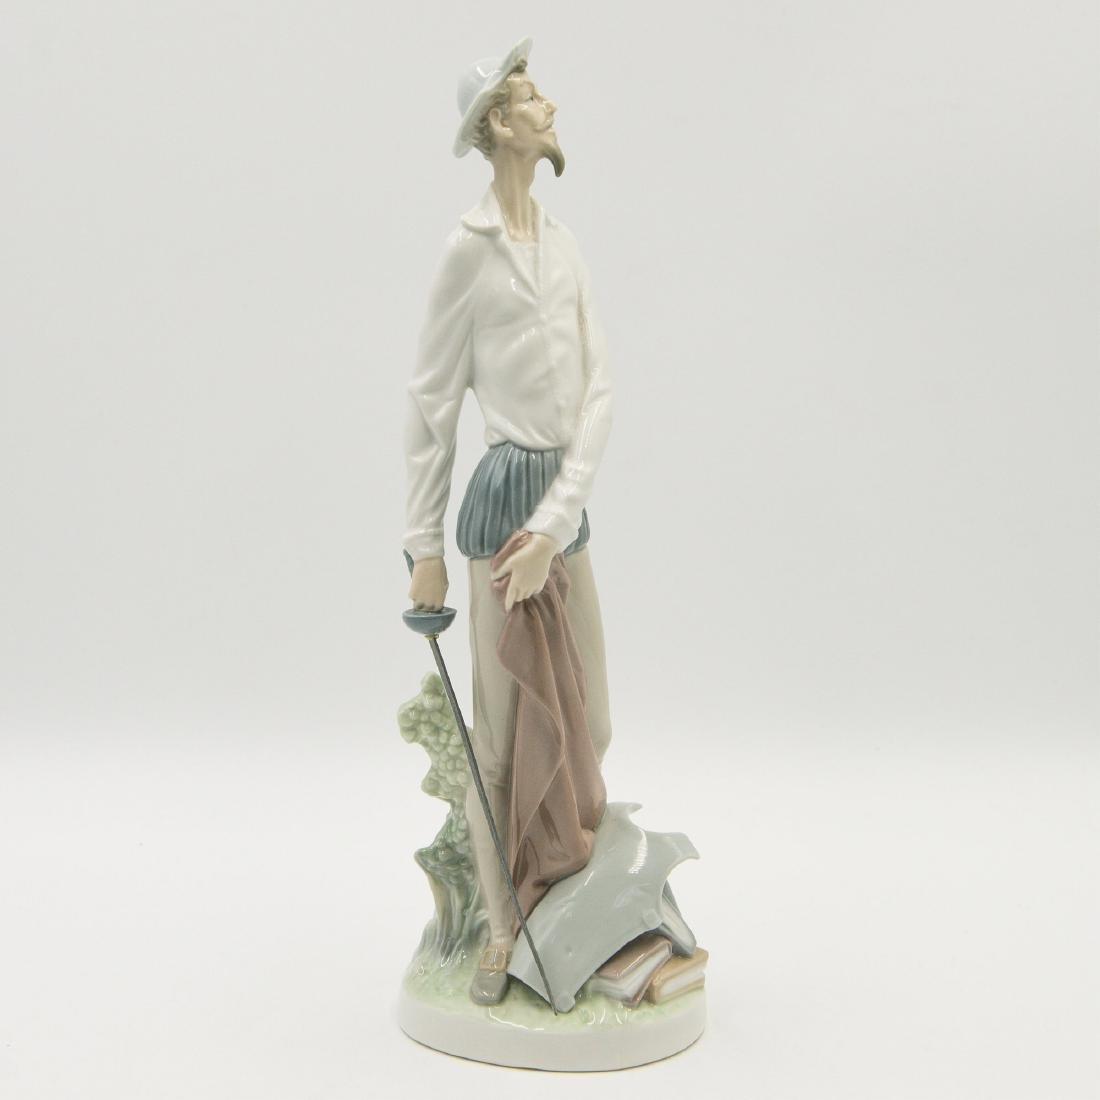 Lladro Quixote Standing Up Figure (4854)